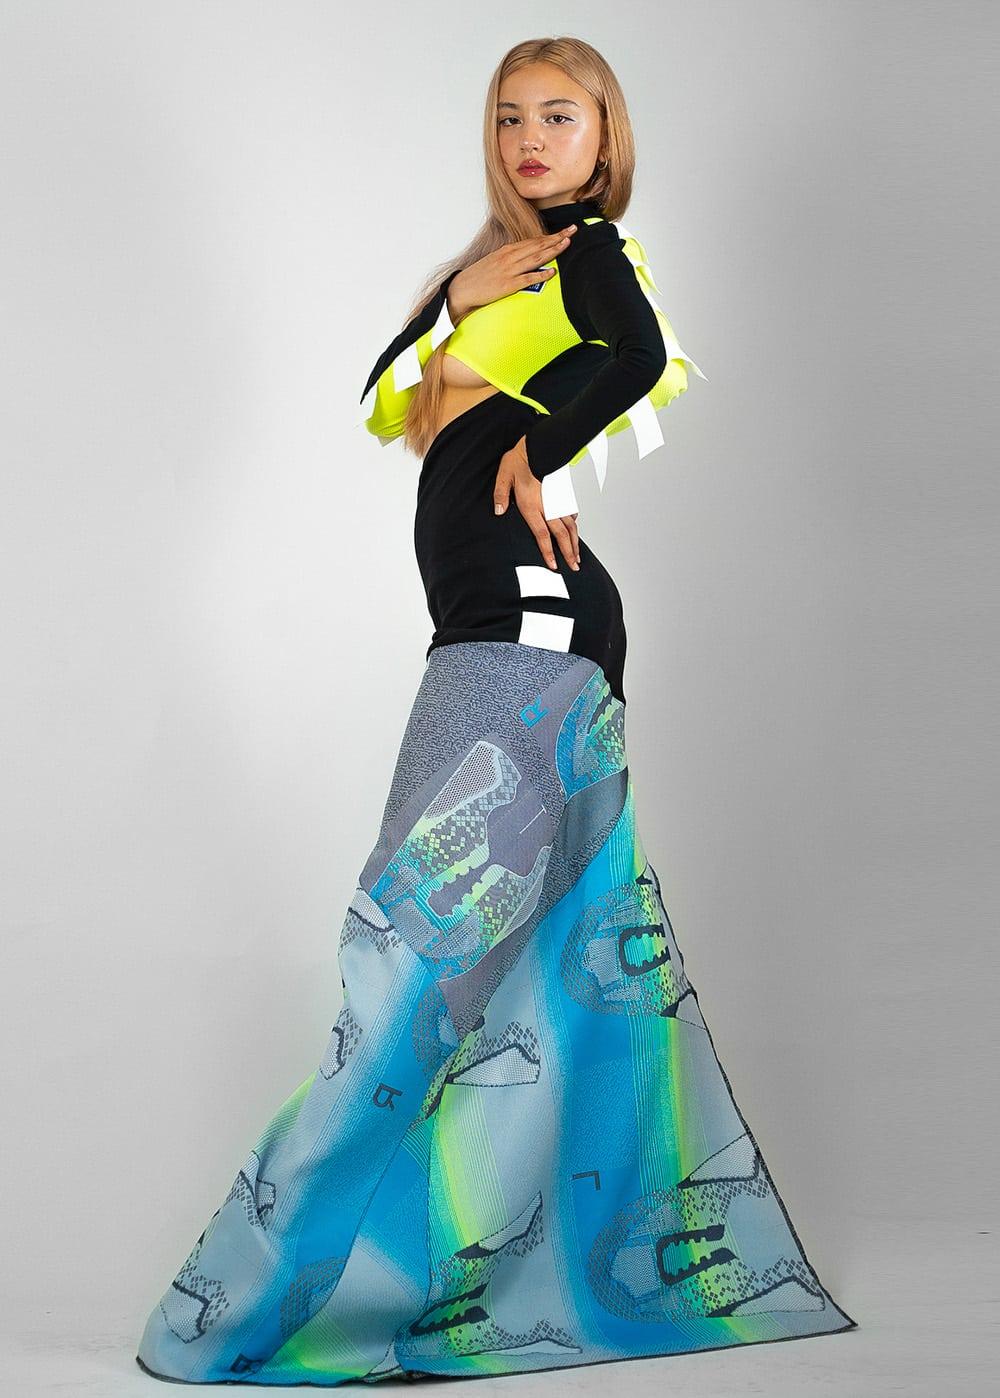 Jingfu Upcycled Adidas Gown 2